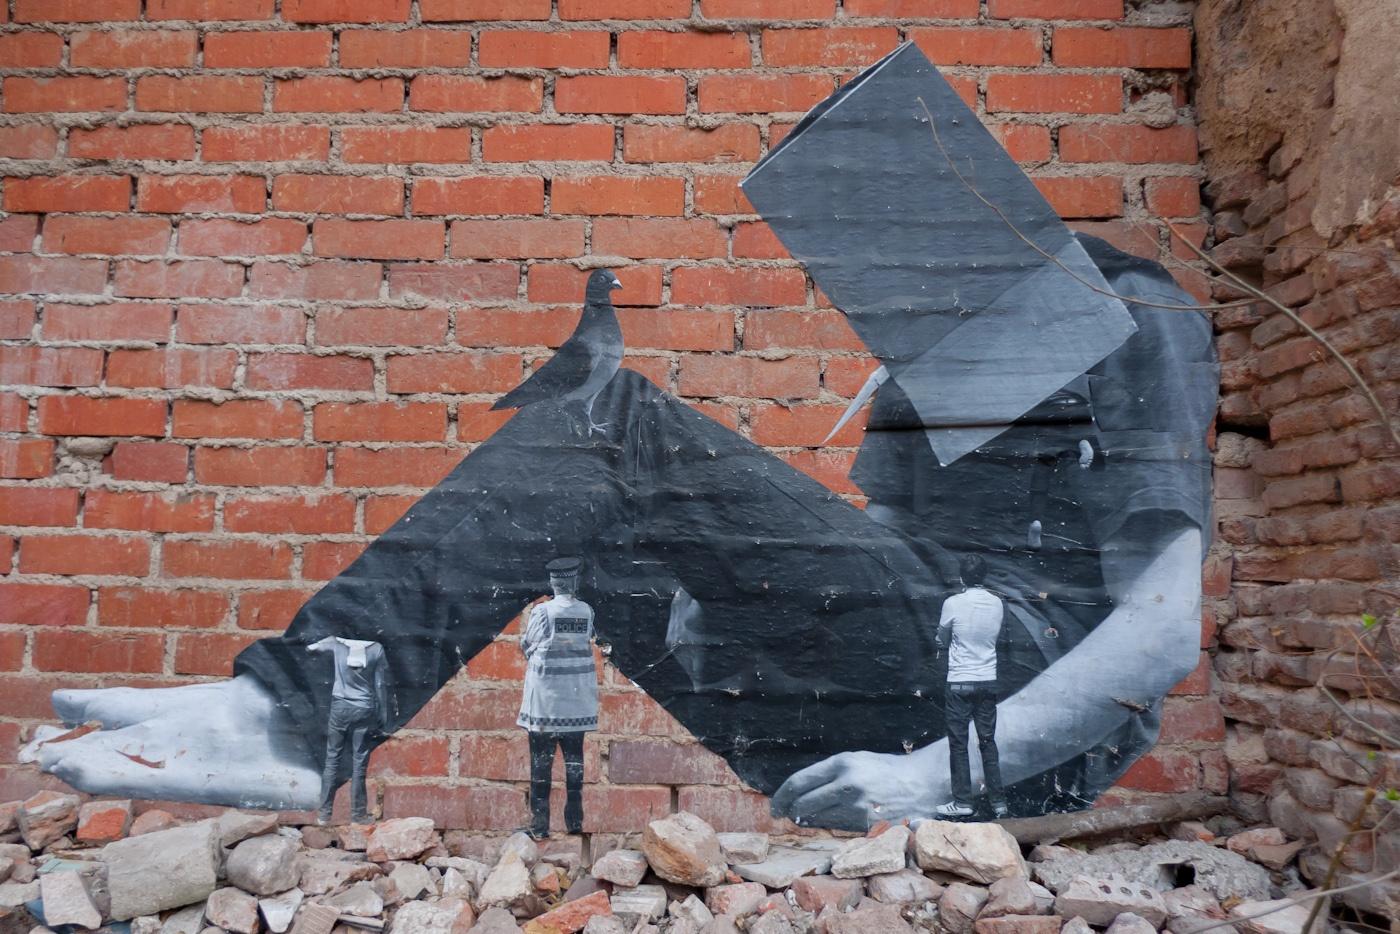 Lavapies Street art r2hox